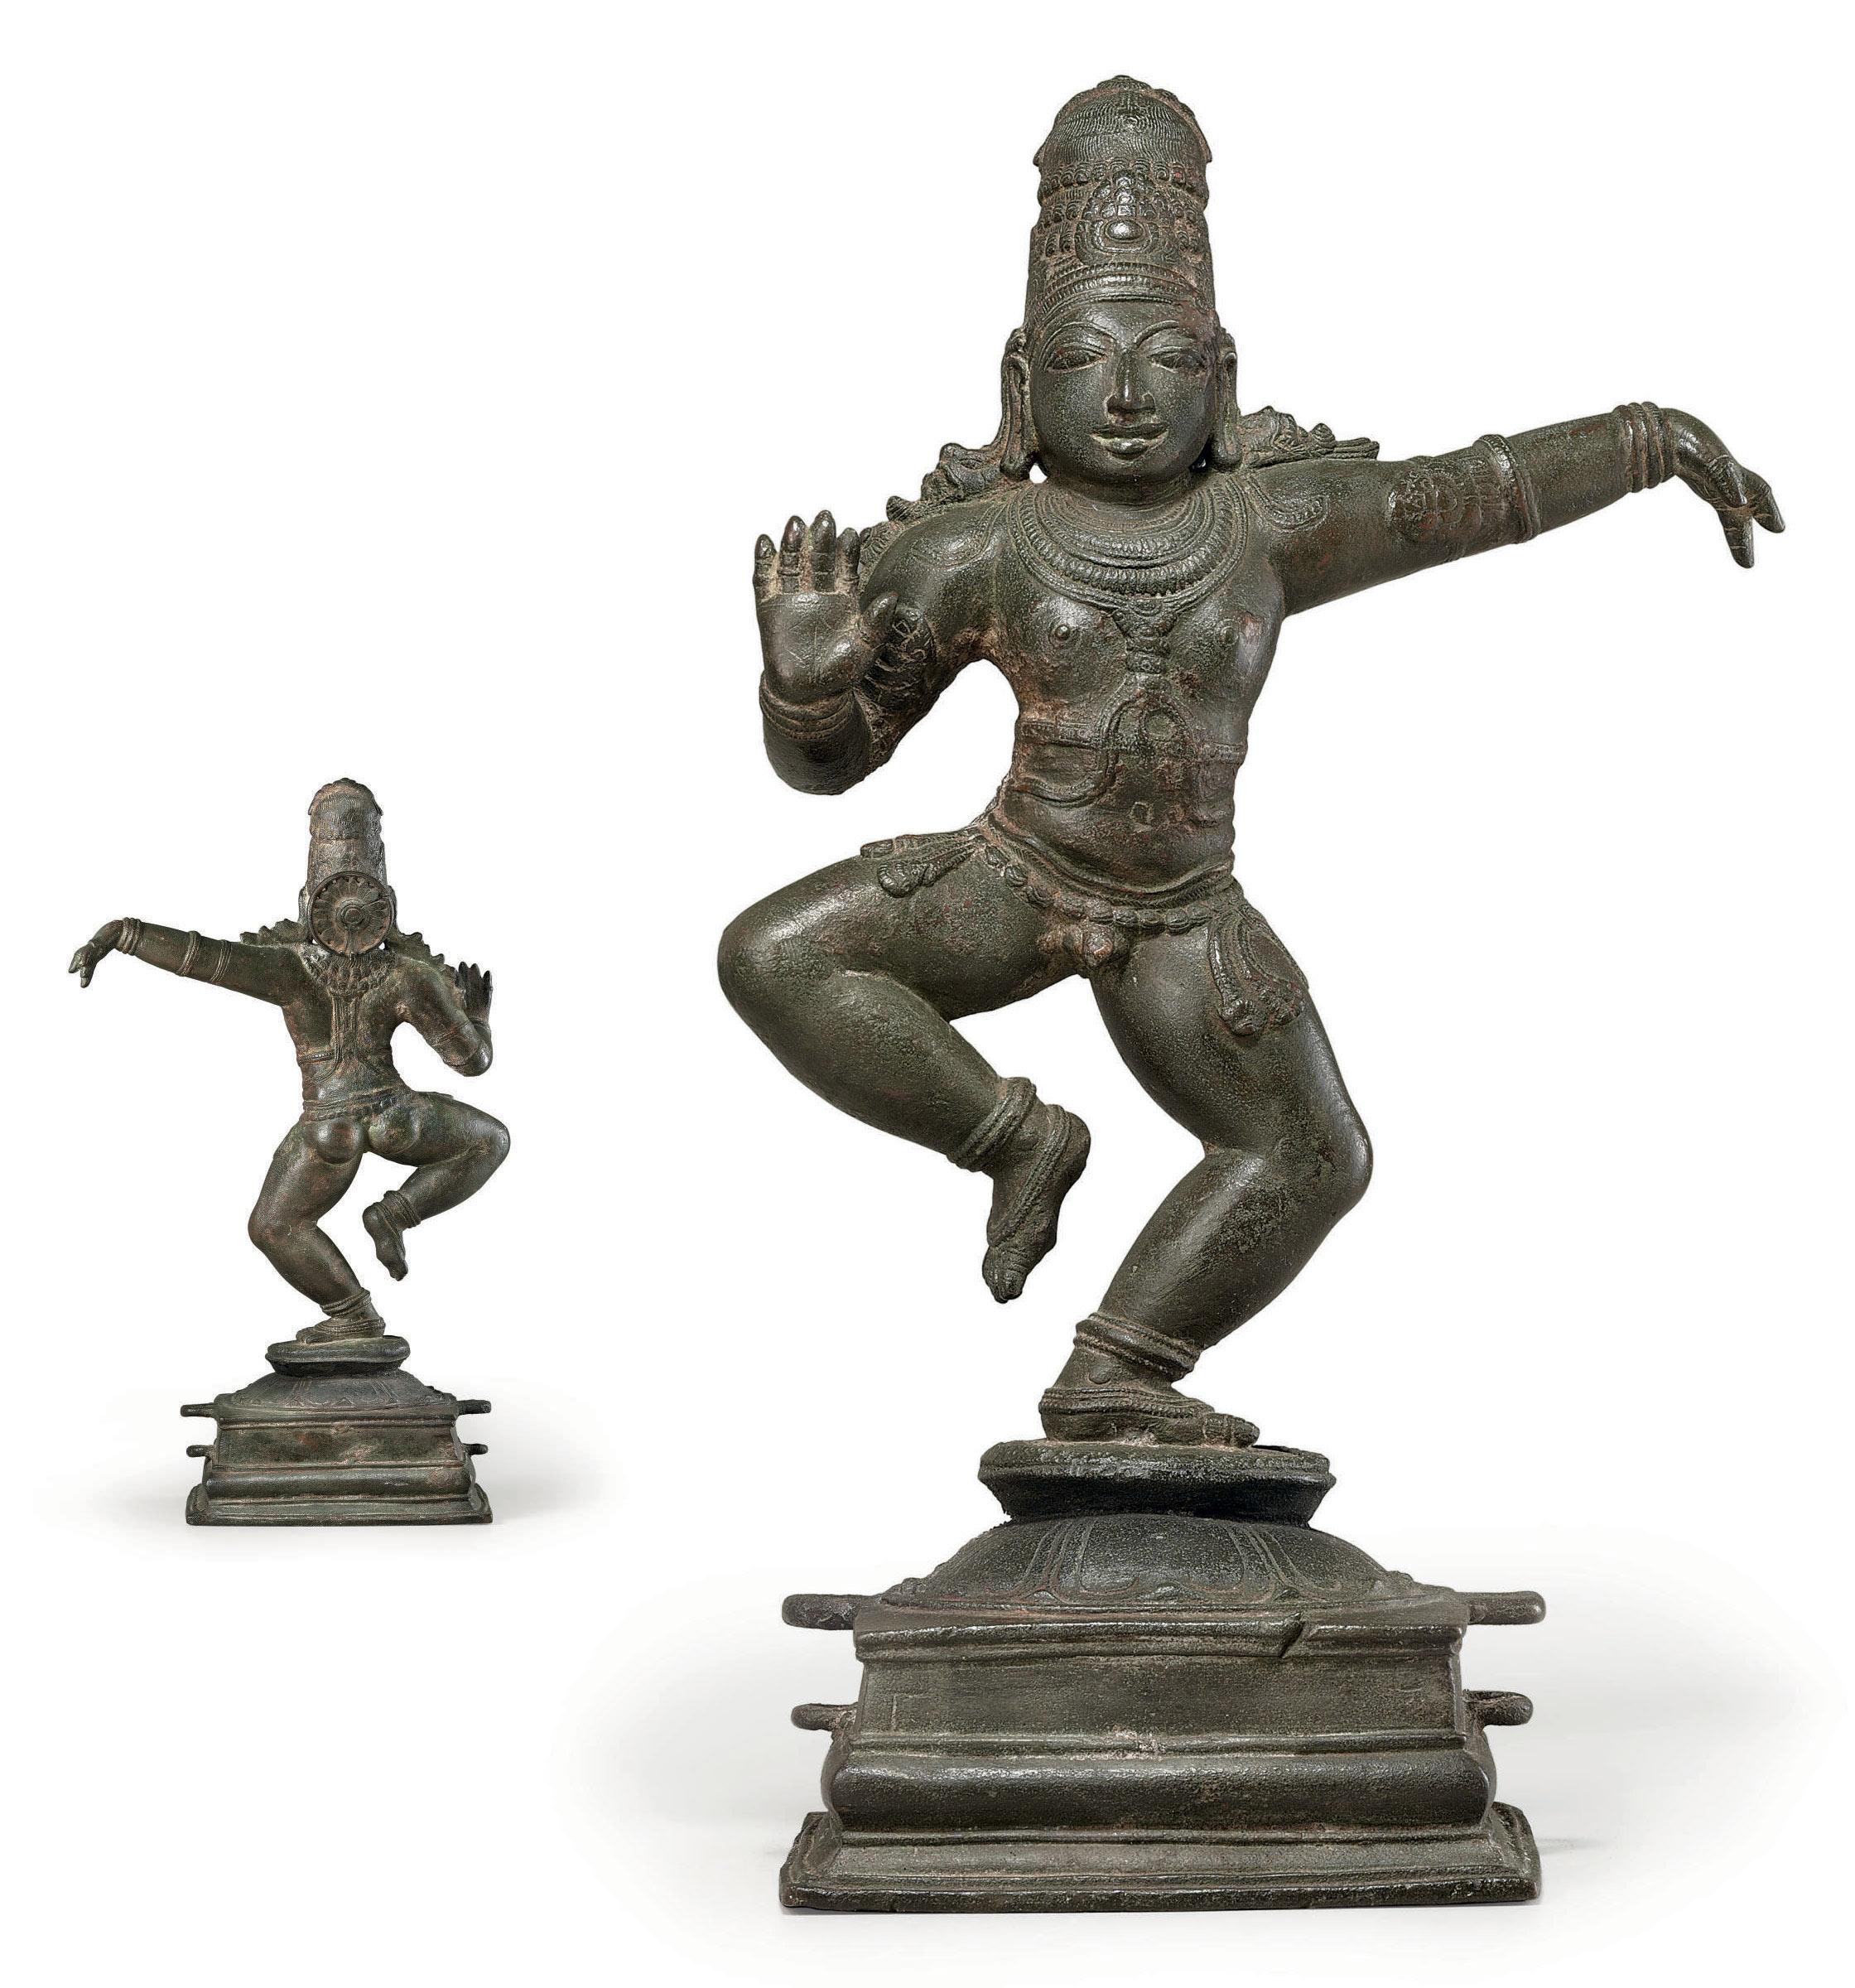 A bronze figure of Balakrishna